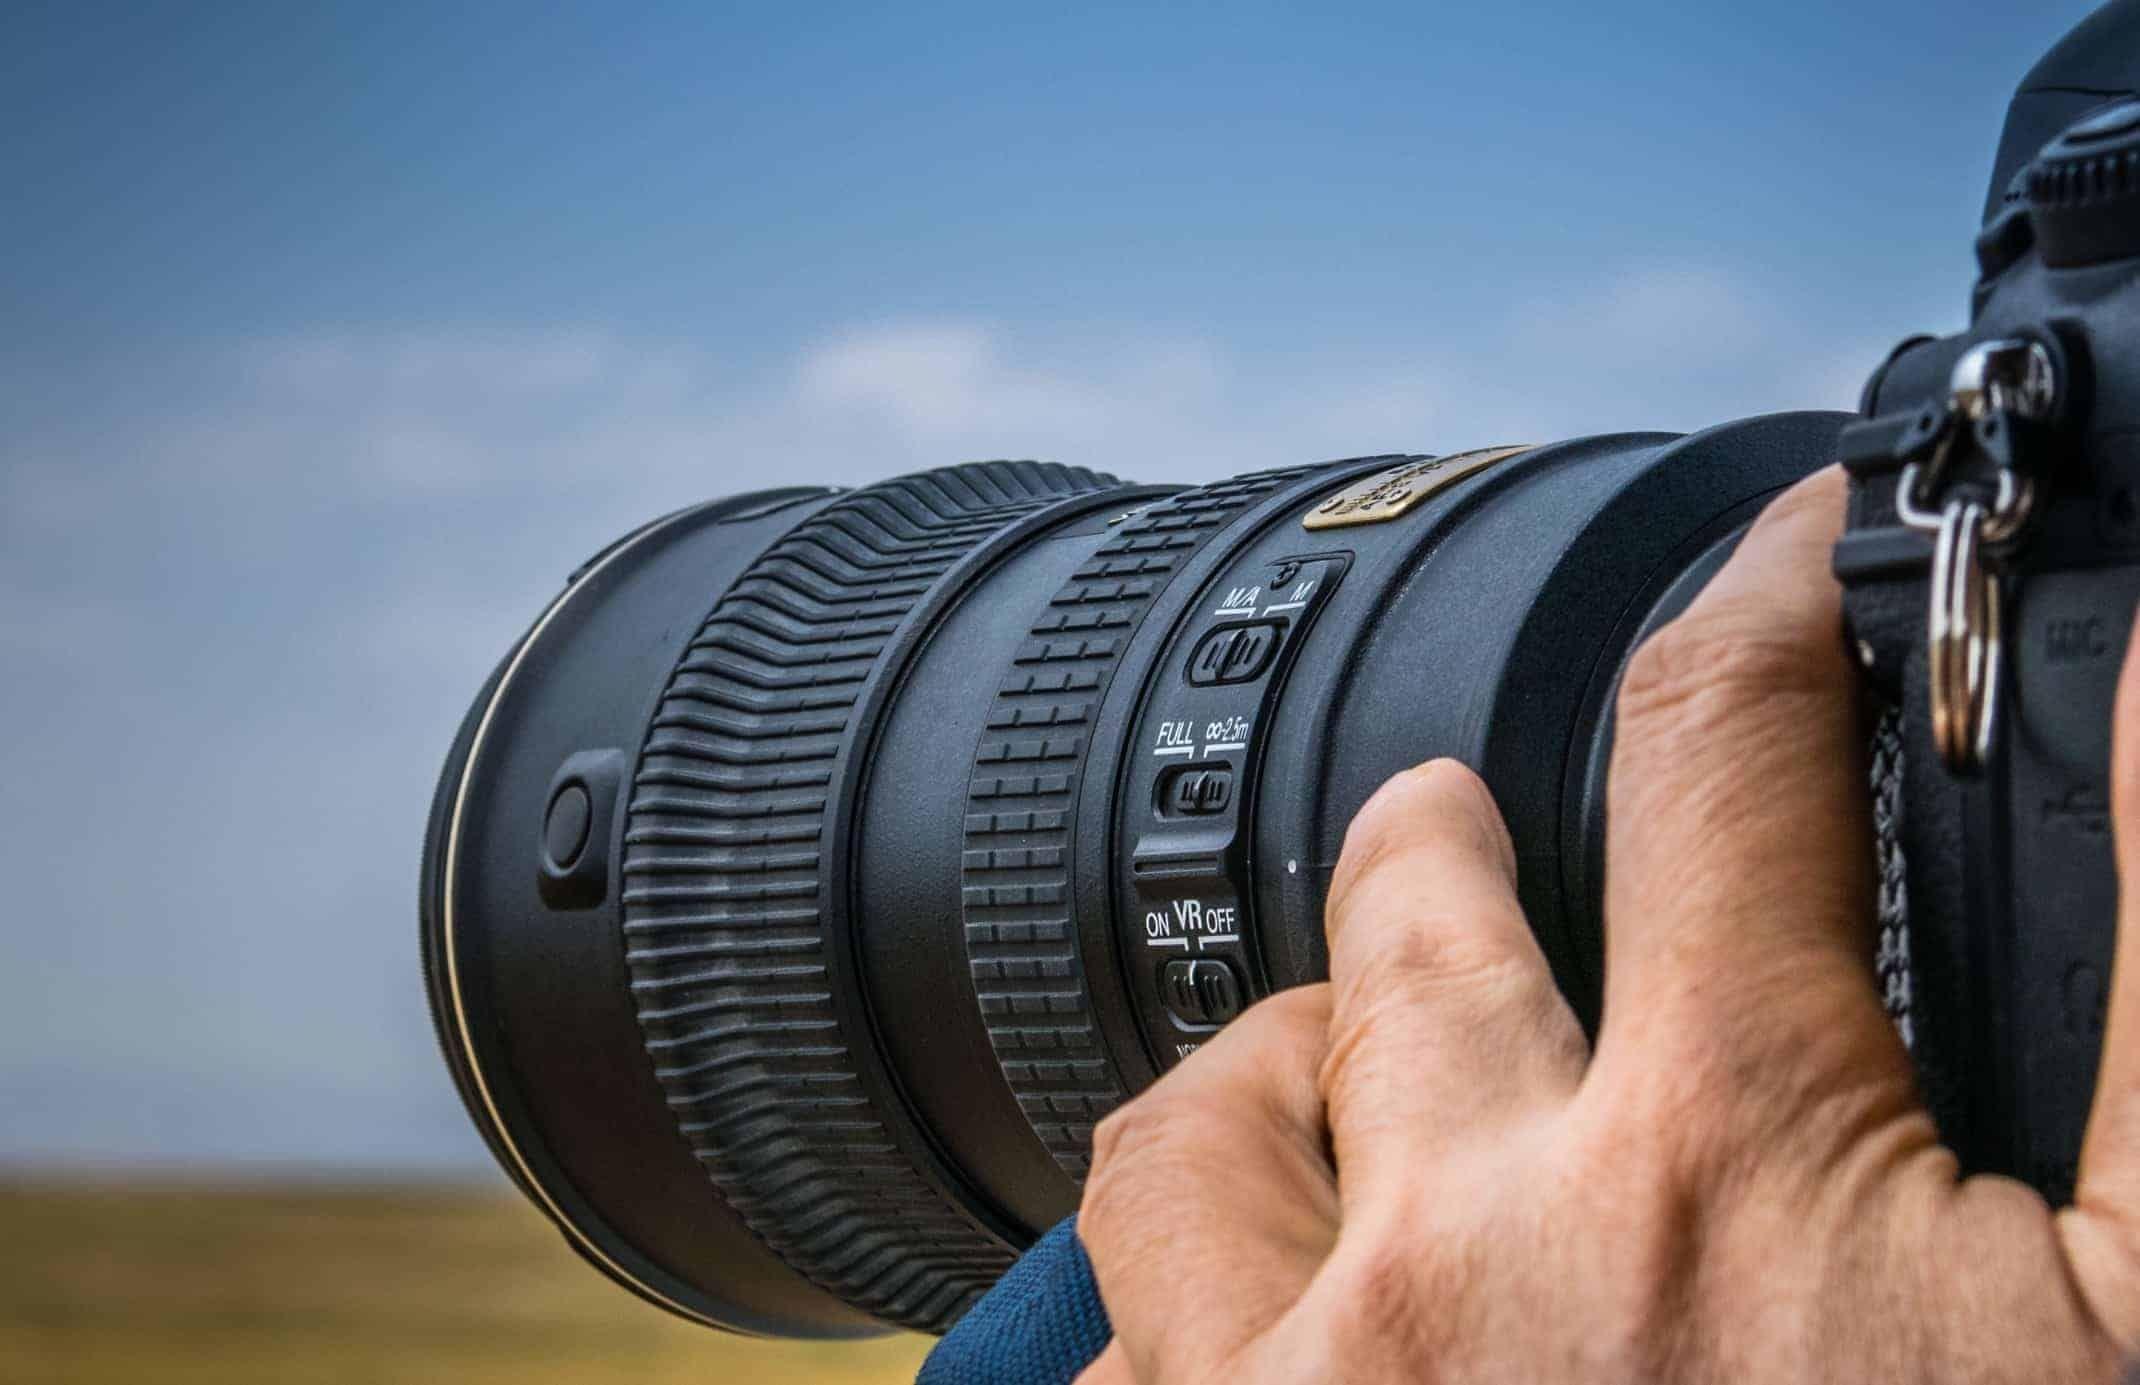 Best Nikon Landscape Lenses In 2020 13 Great Picks In 2020 Landscape Lens Photography Lenses Canon Super Telephoto Lens